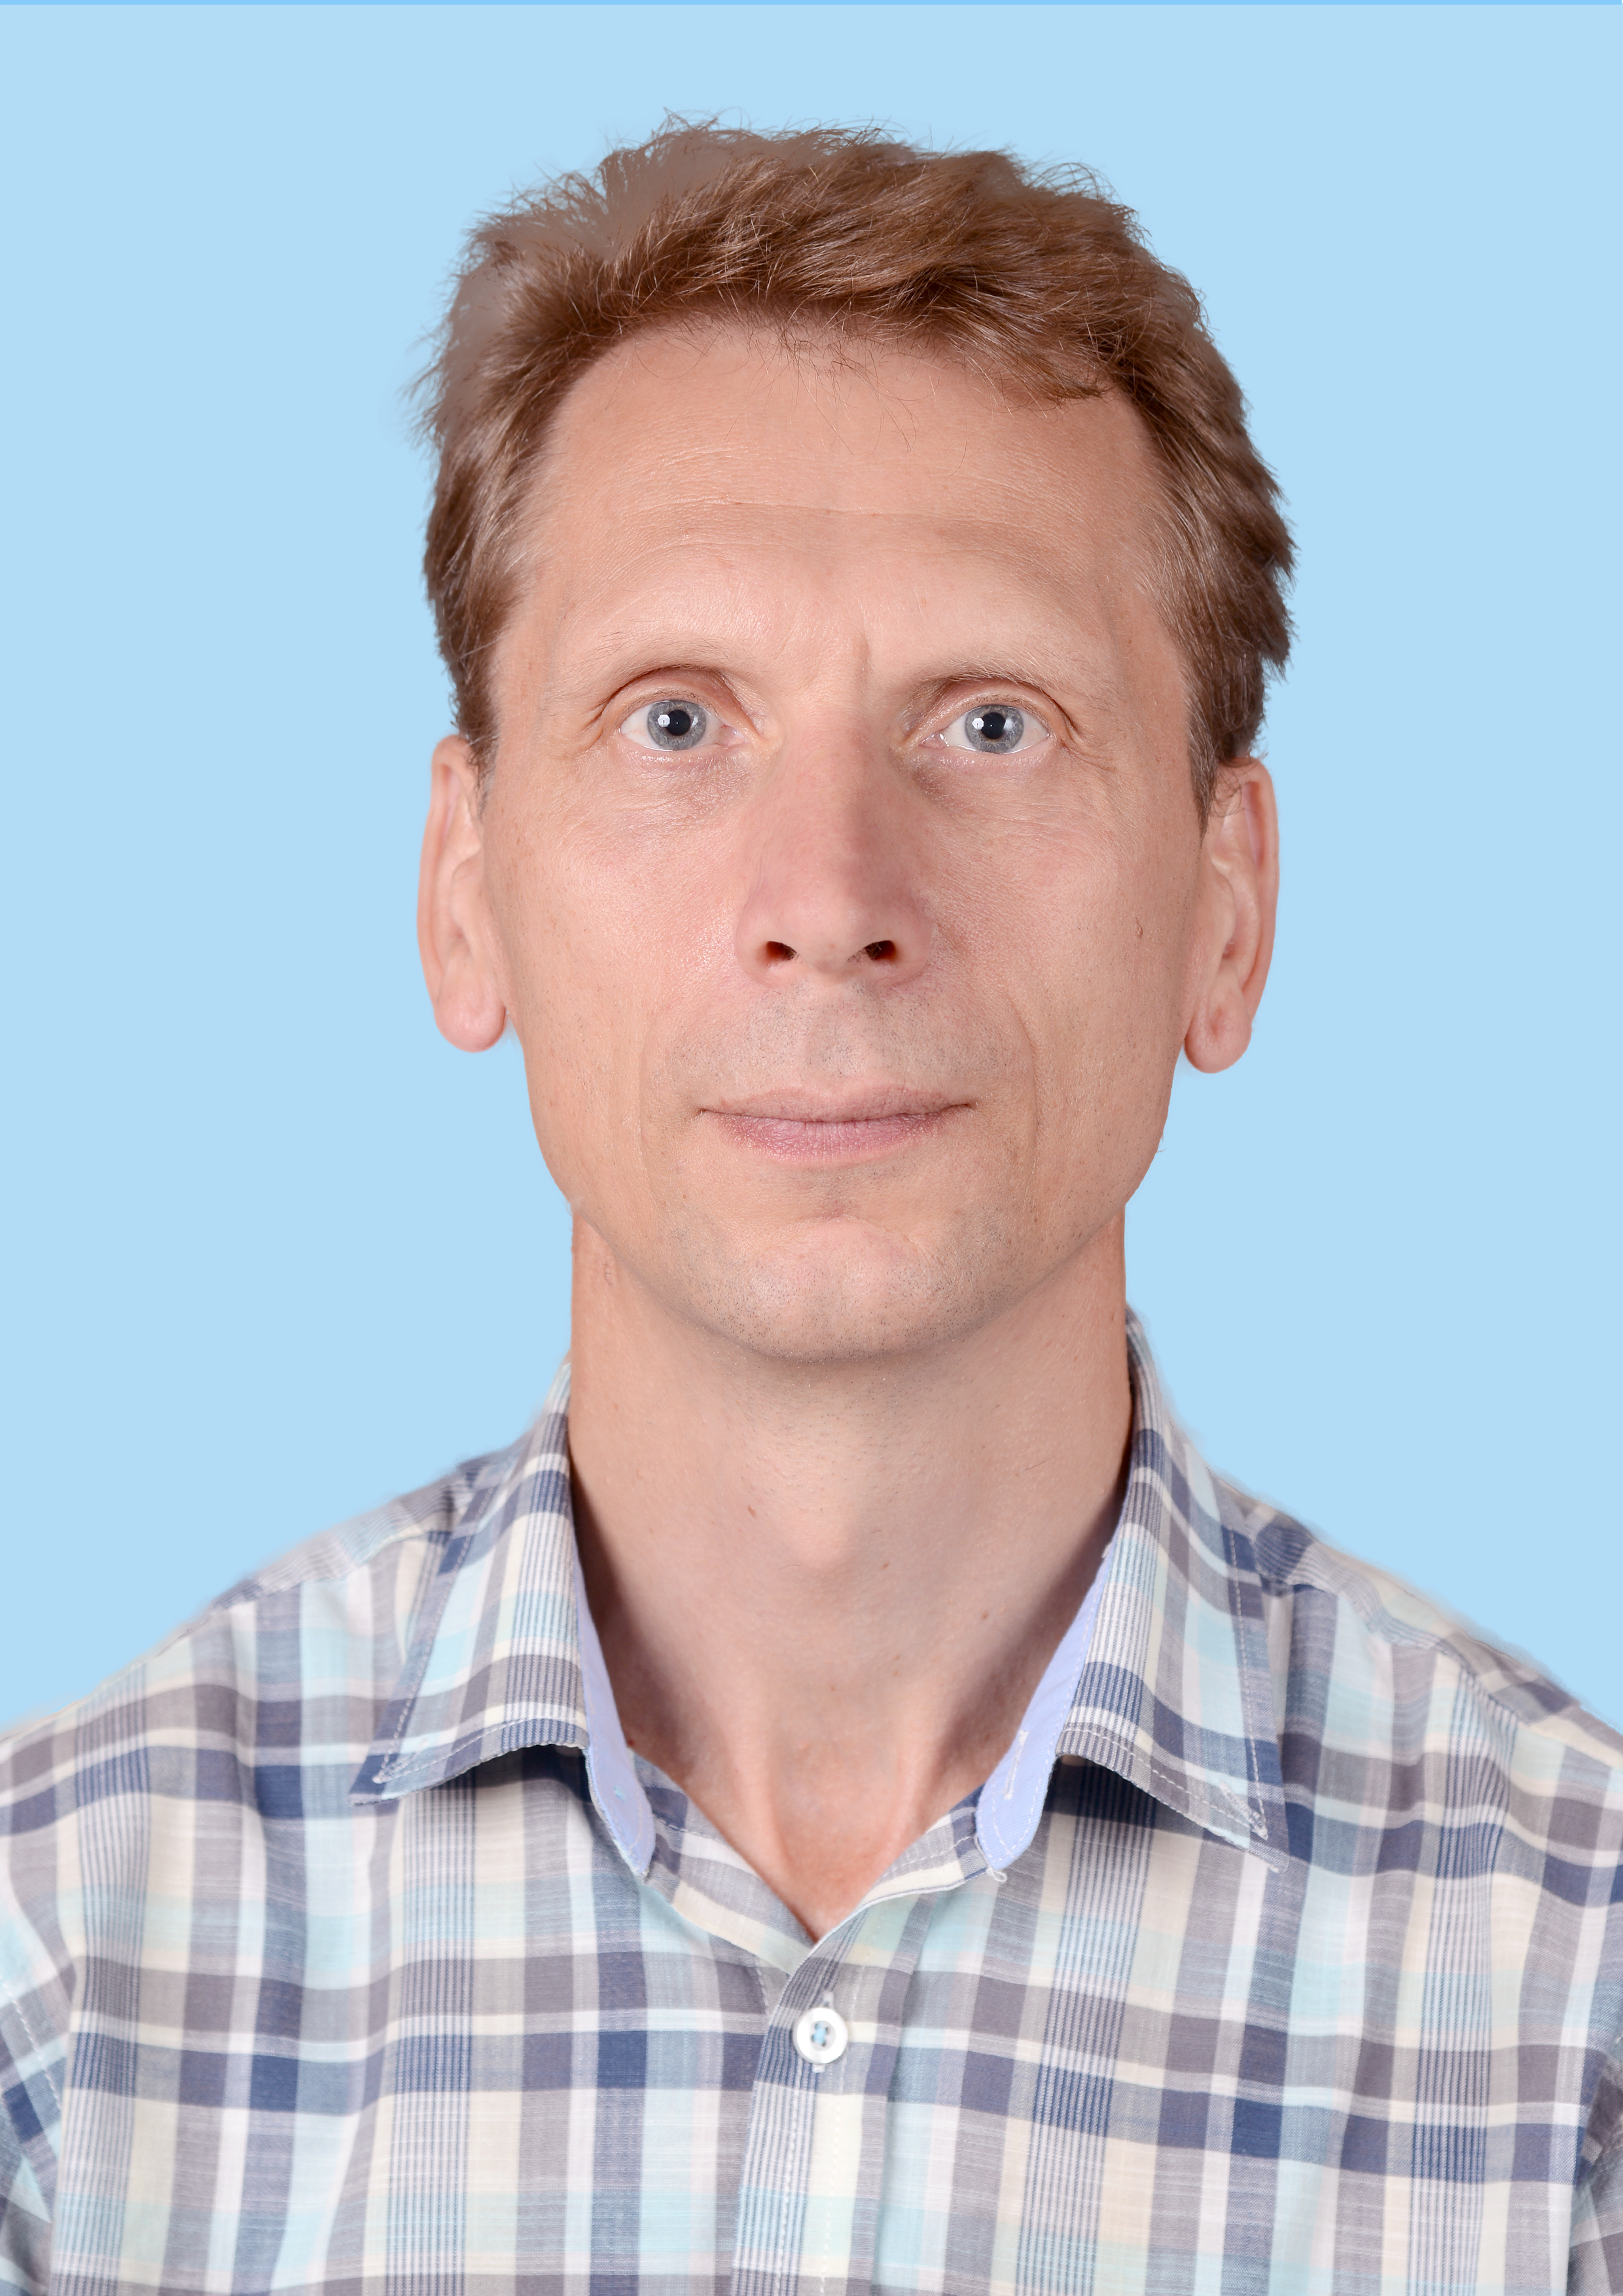 Прибытков Дмитрий Витальевич